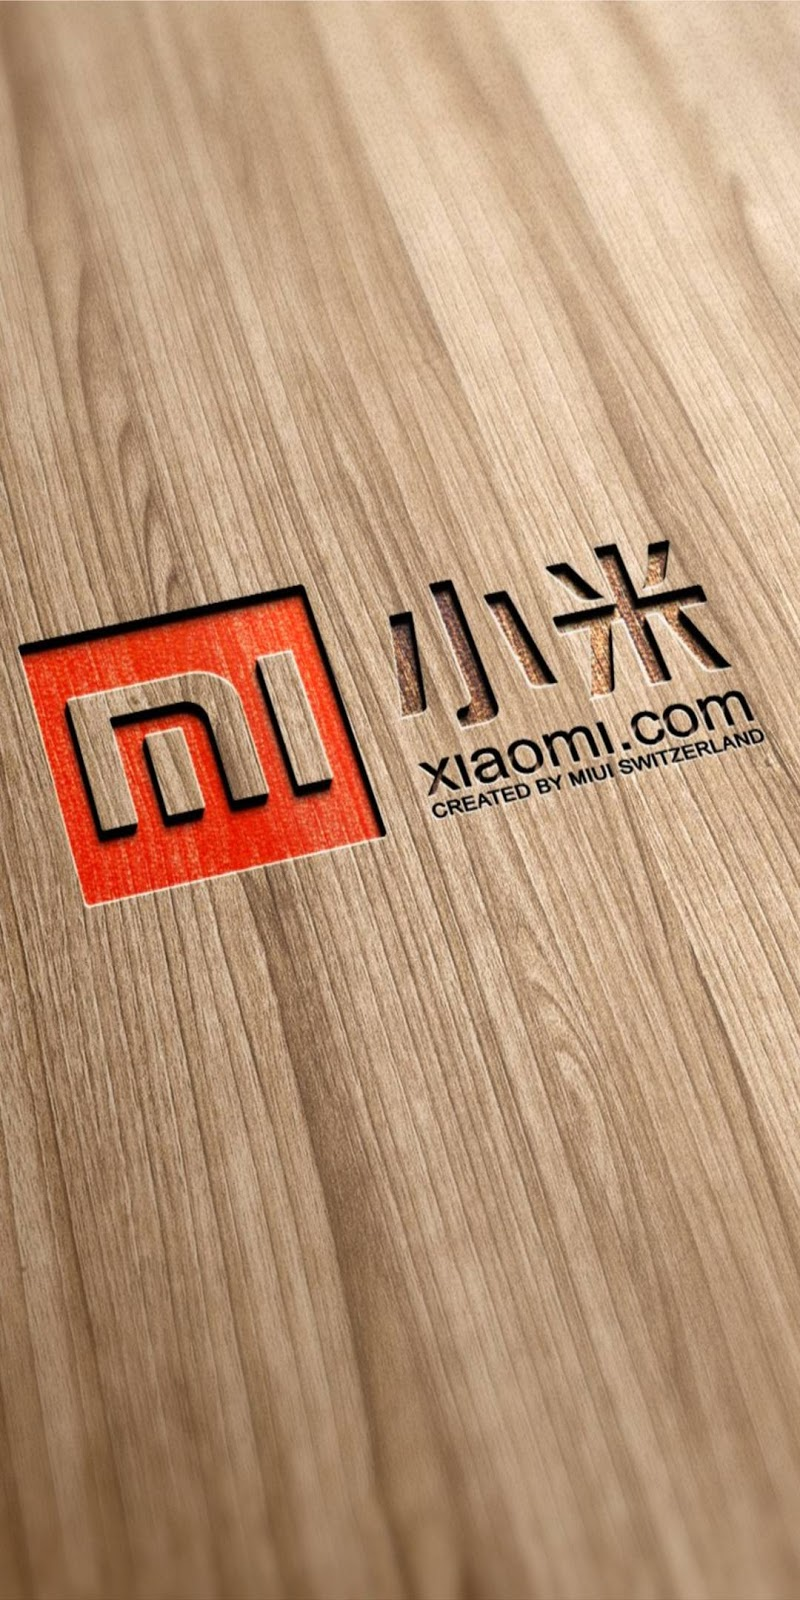 Phone Logo Xiomi Mi Logo Wallpaper 4k 800x1600 Wallpaper Teahub Io